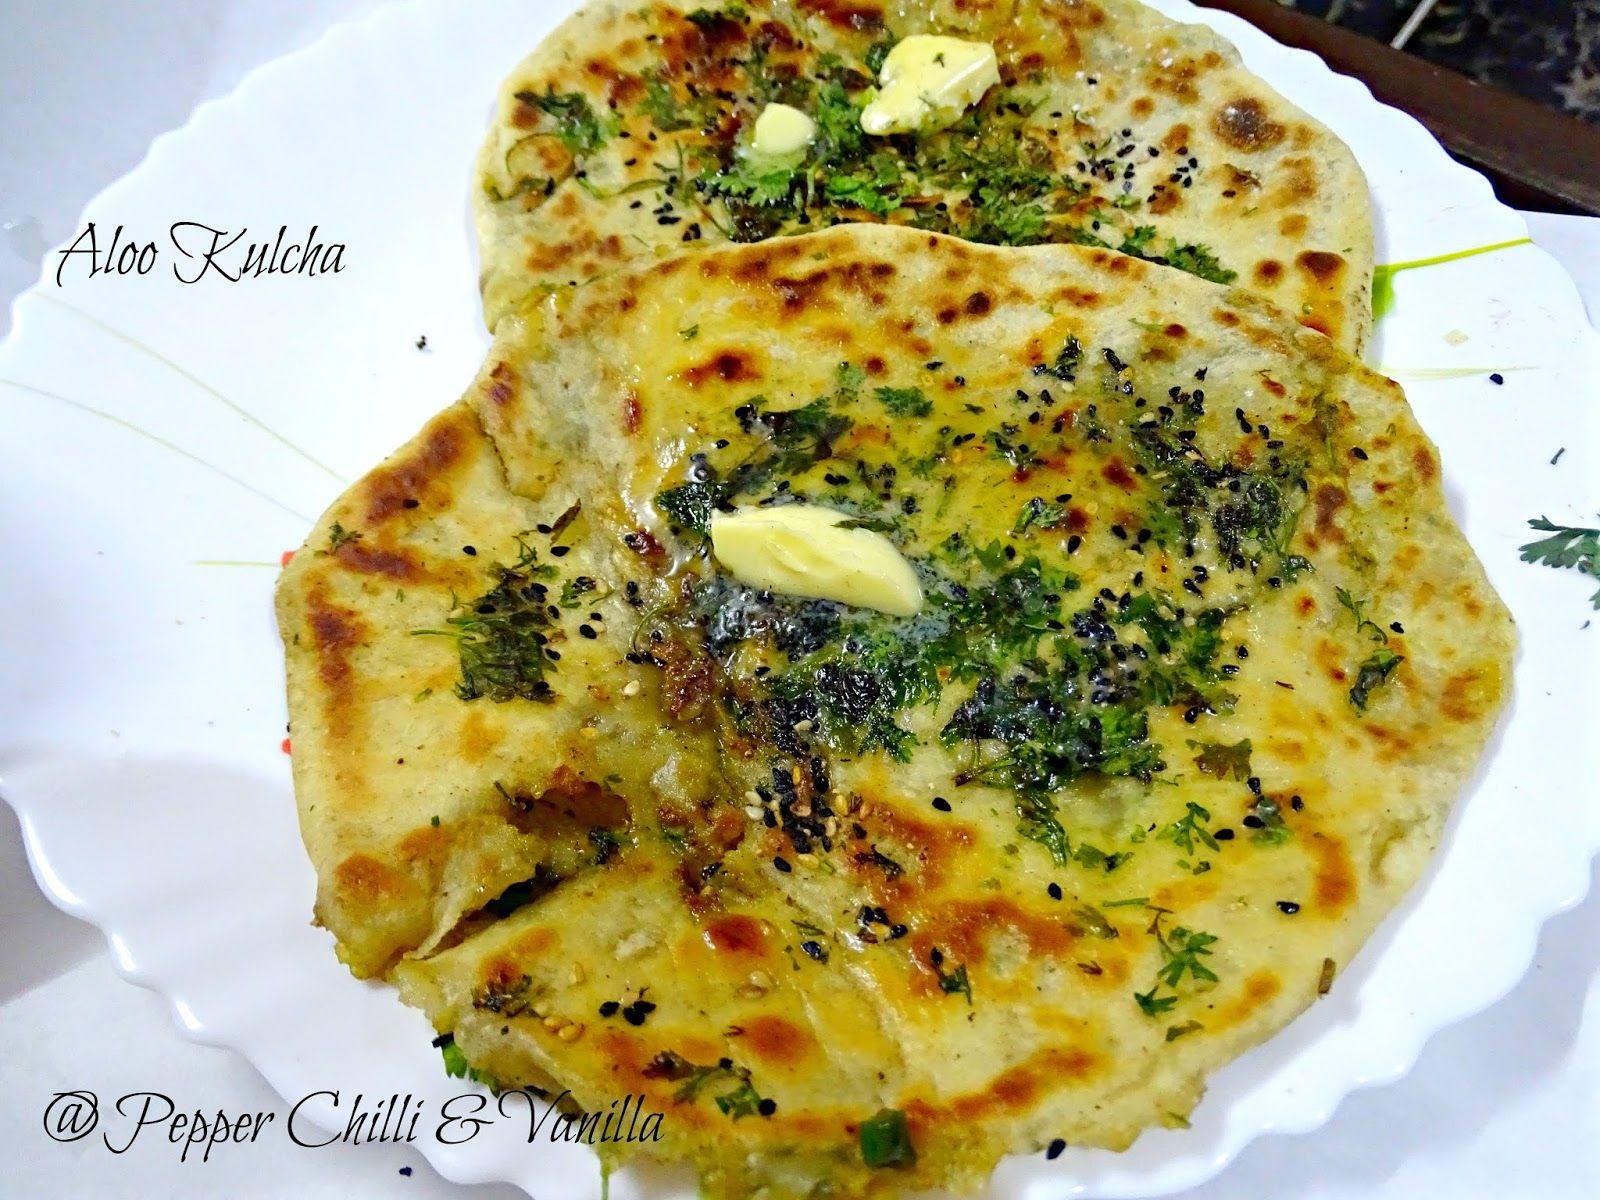 Amritsari kulcha aloo kulcha recipes indian breads and rotis vegan indian food amritsari aloo kulcha recipe forumfinder Choice Image